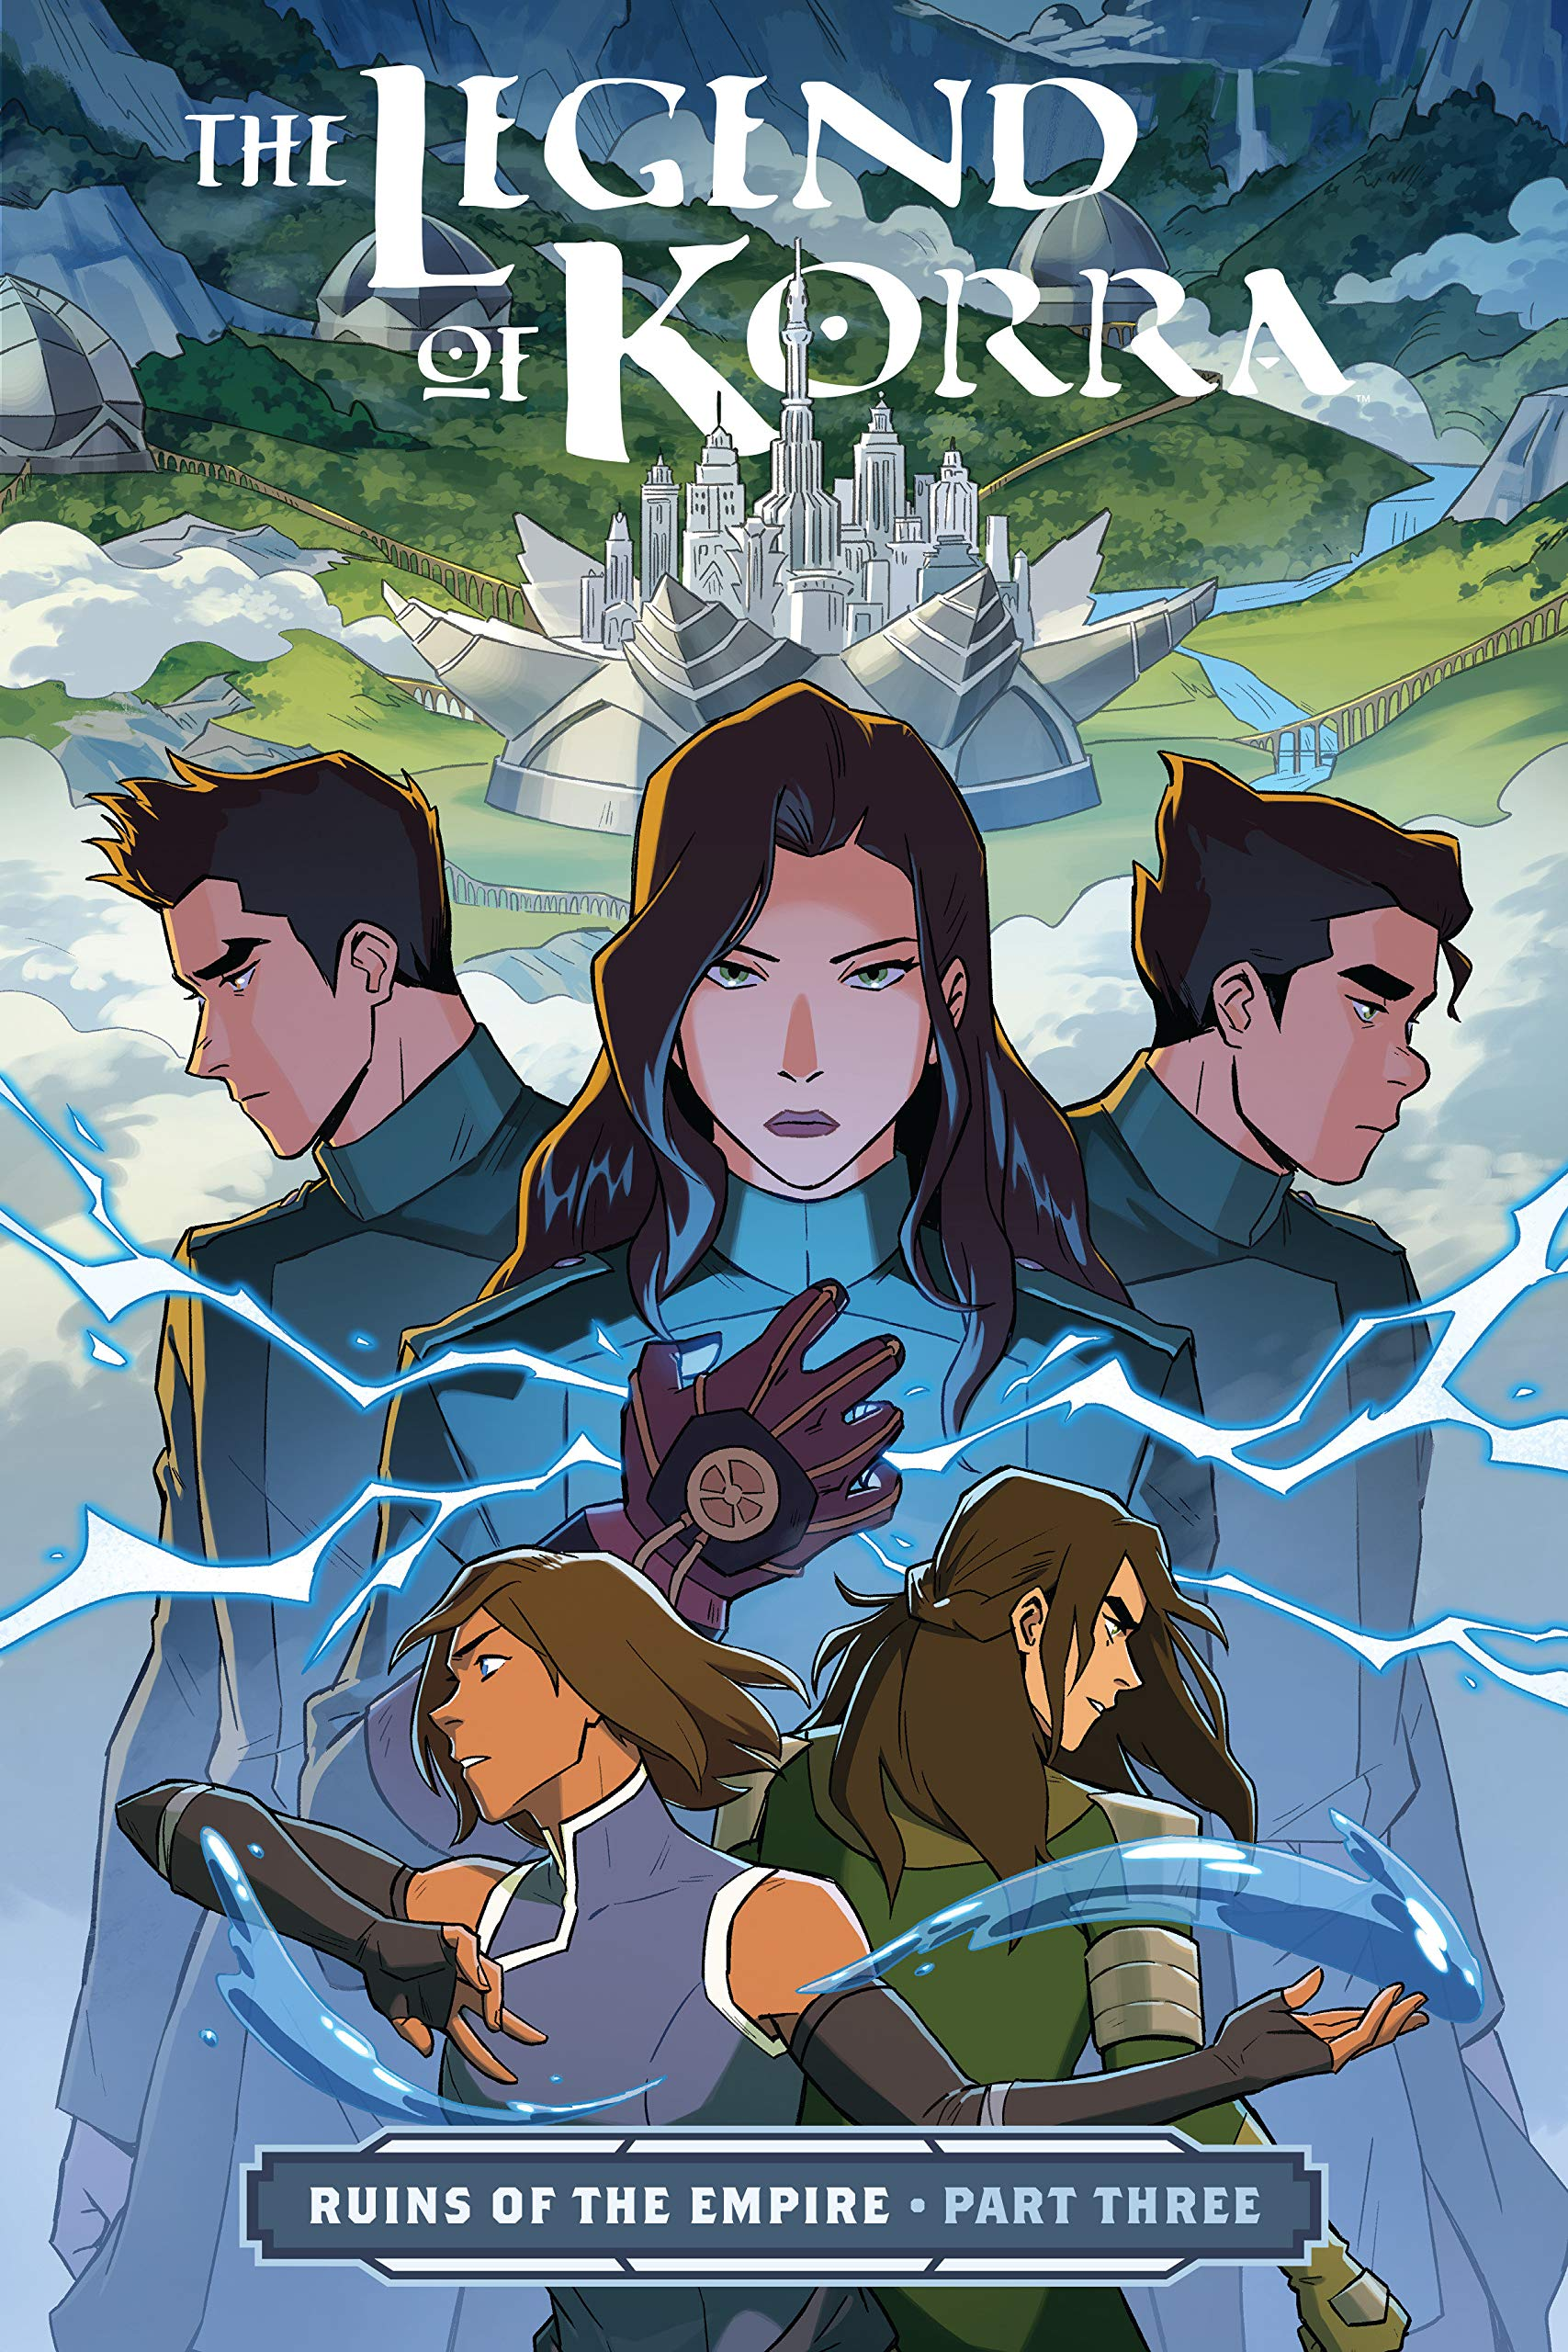 Amazon.fr - The Legend of Korra: Ruins of the Empire Part Three - DiMartino, Michael Dante, Wong, Michelle, Ng, Killian - Livres